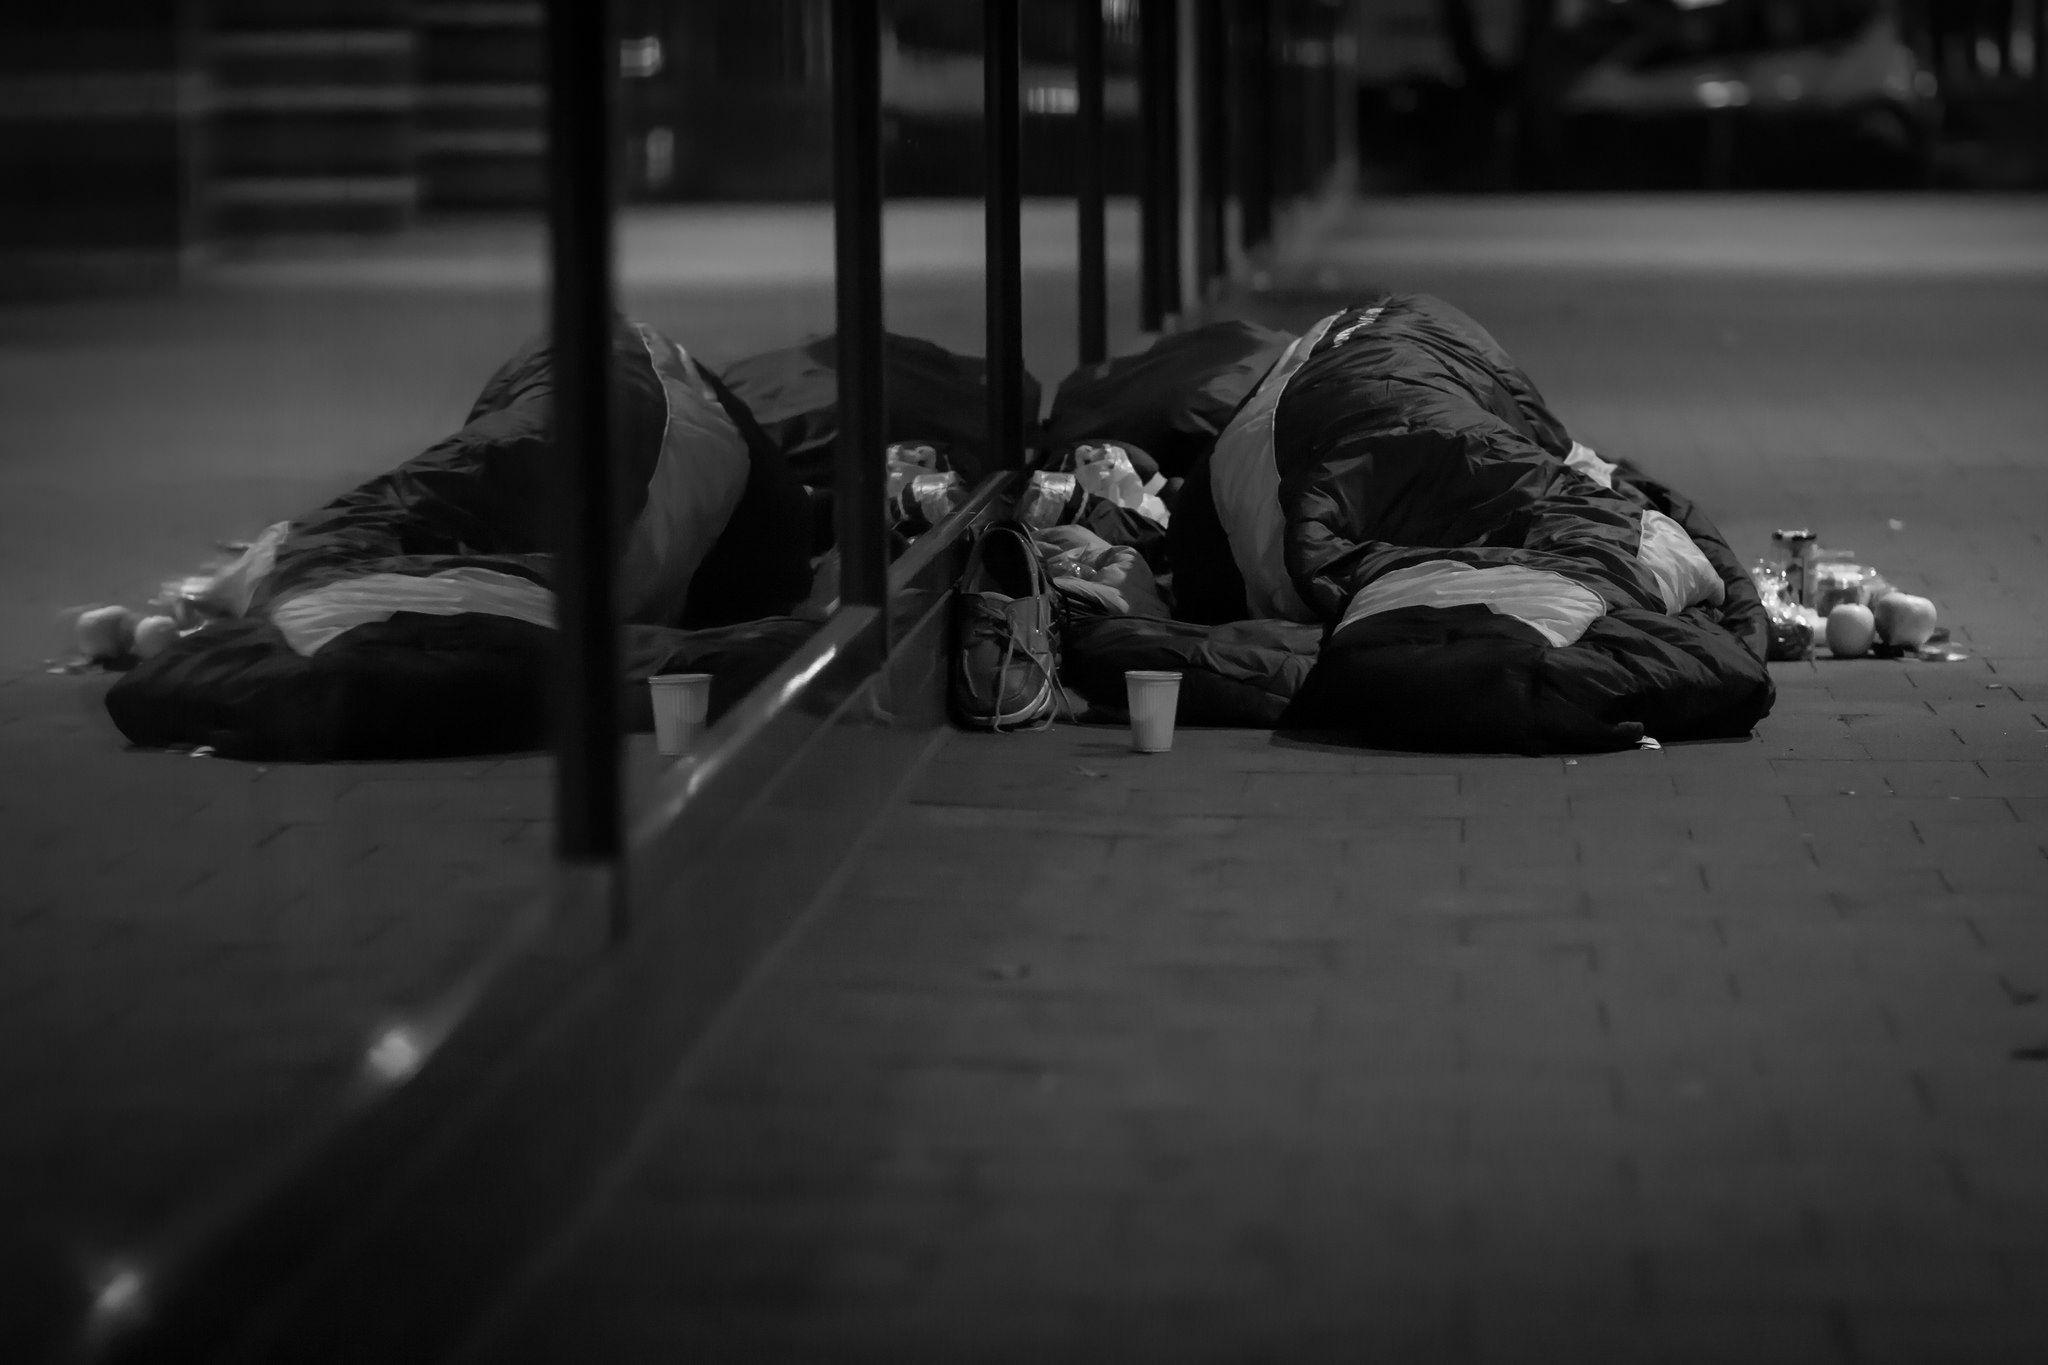 Homelessness in the UK